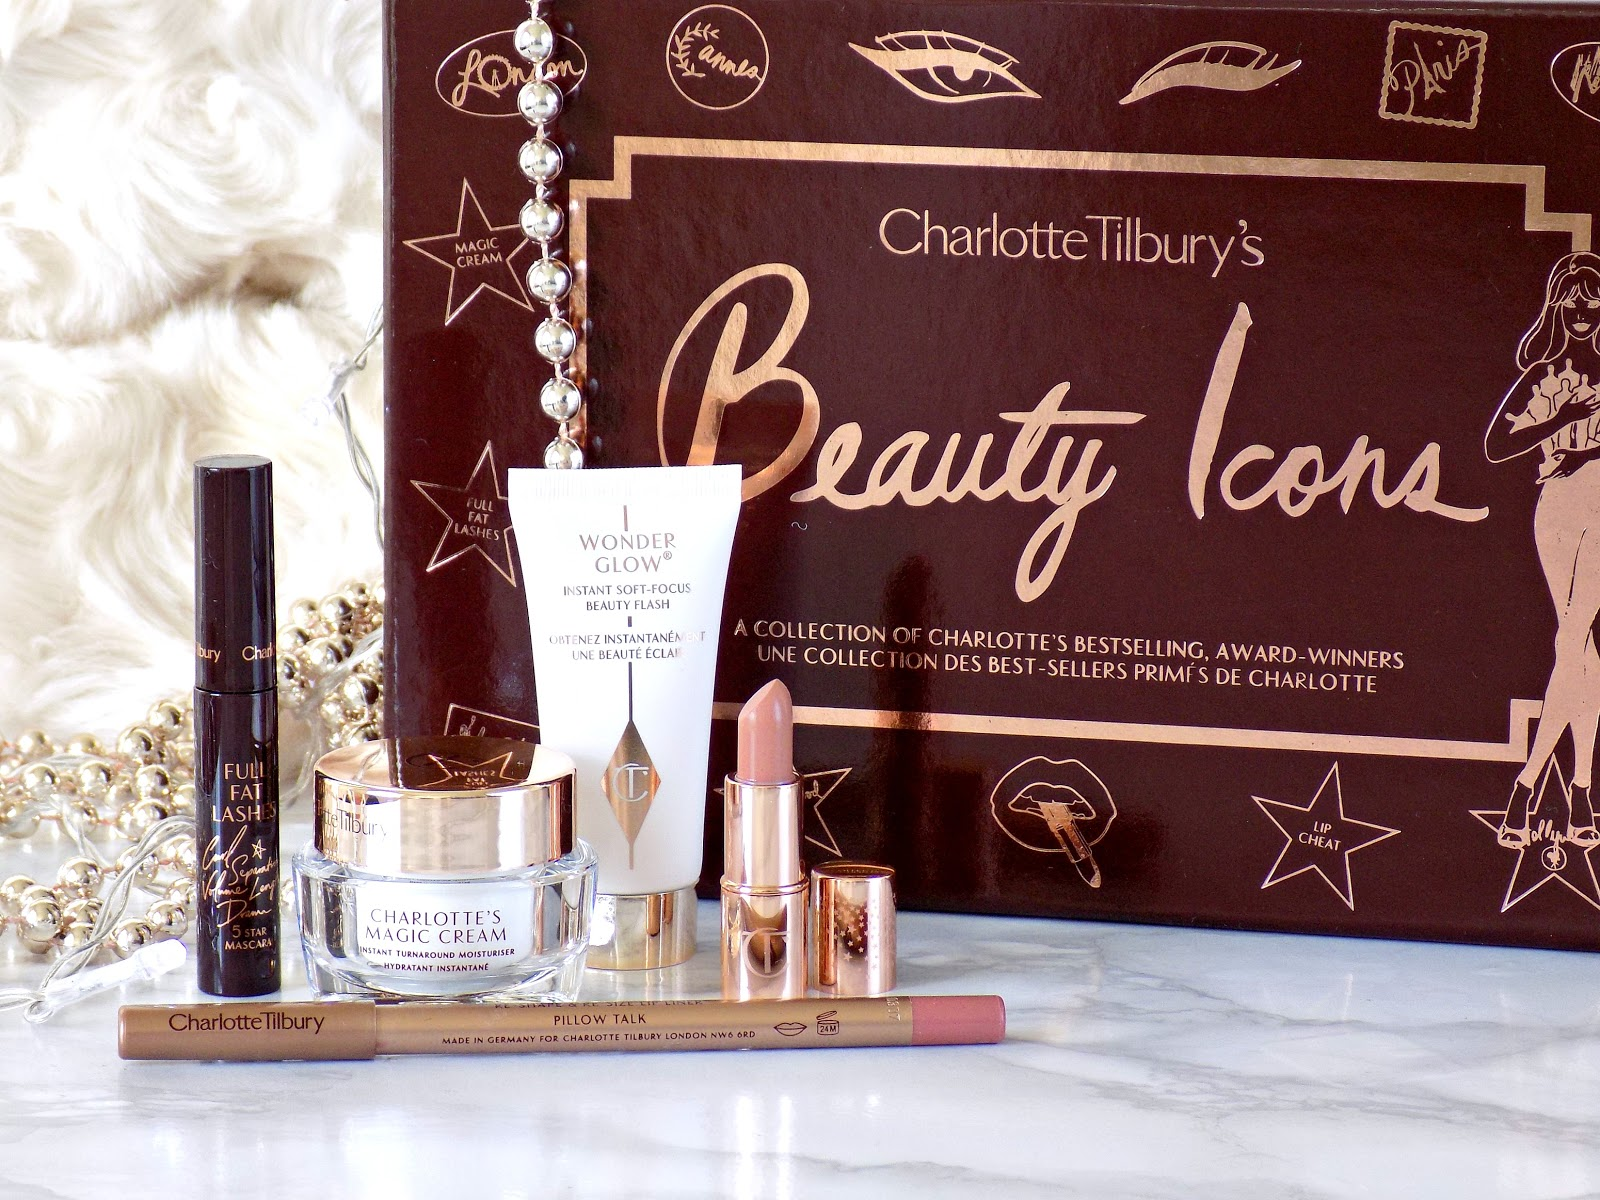 Charlotte Tilbury's Beauty Icons Gift Set